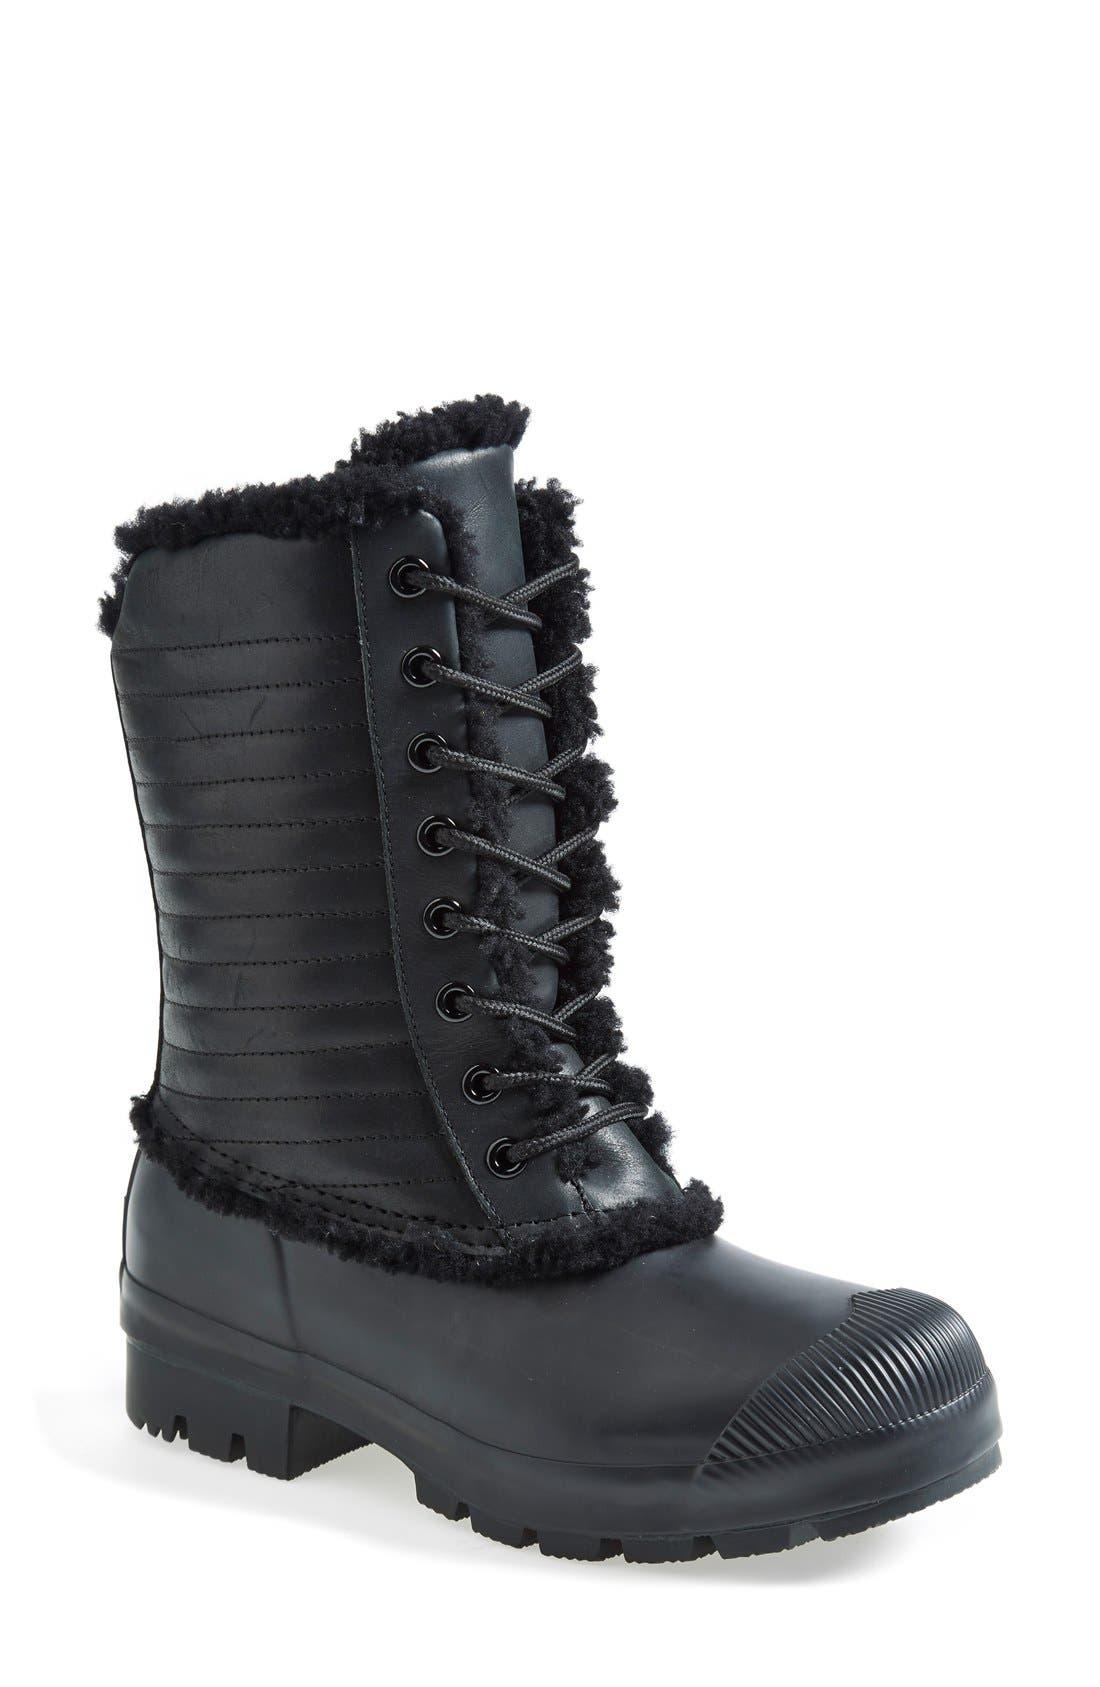 Alternate Image 1 Selected - Hunter Original Genuine Shearling & Patent Leather Lace-Up Rain Boot (Women)